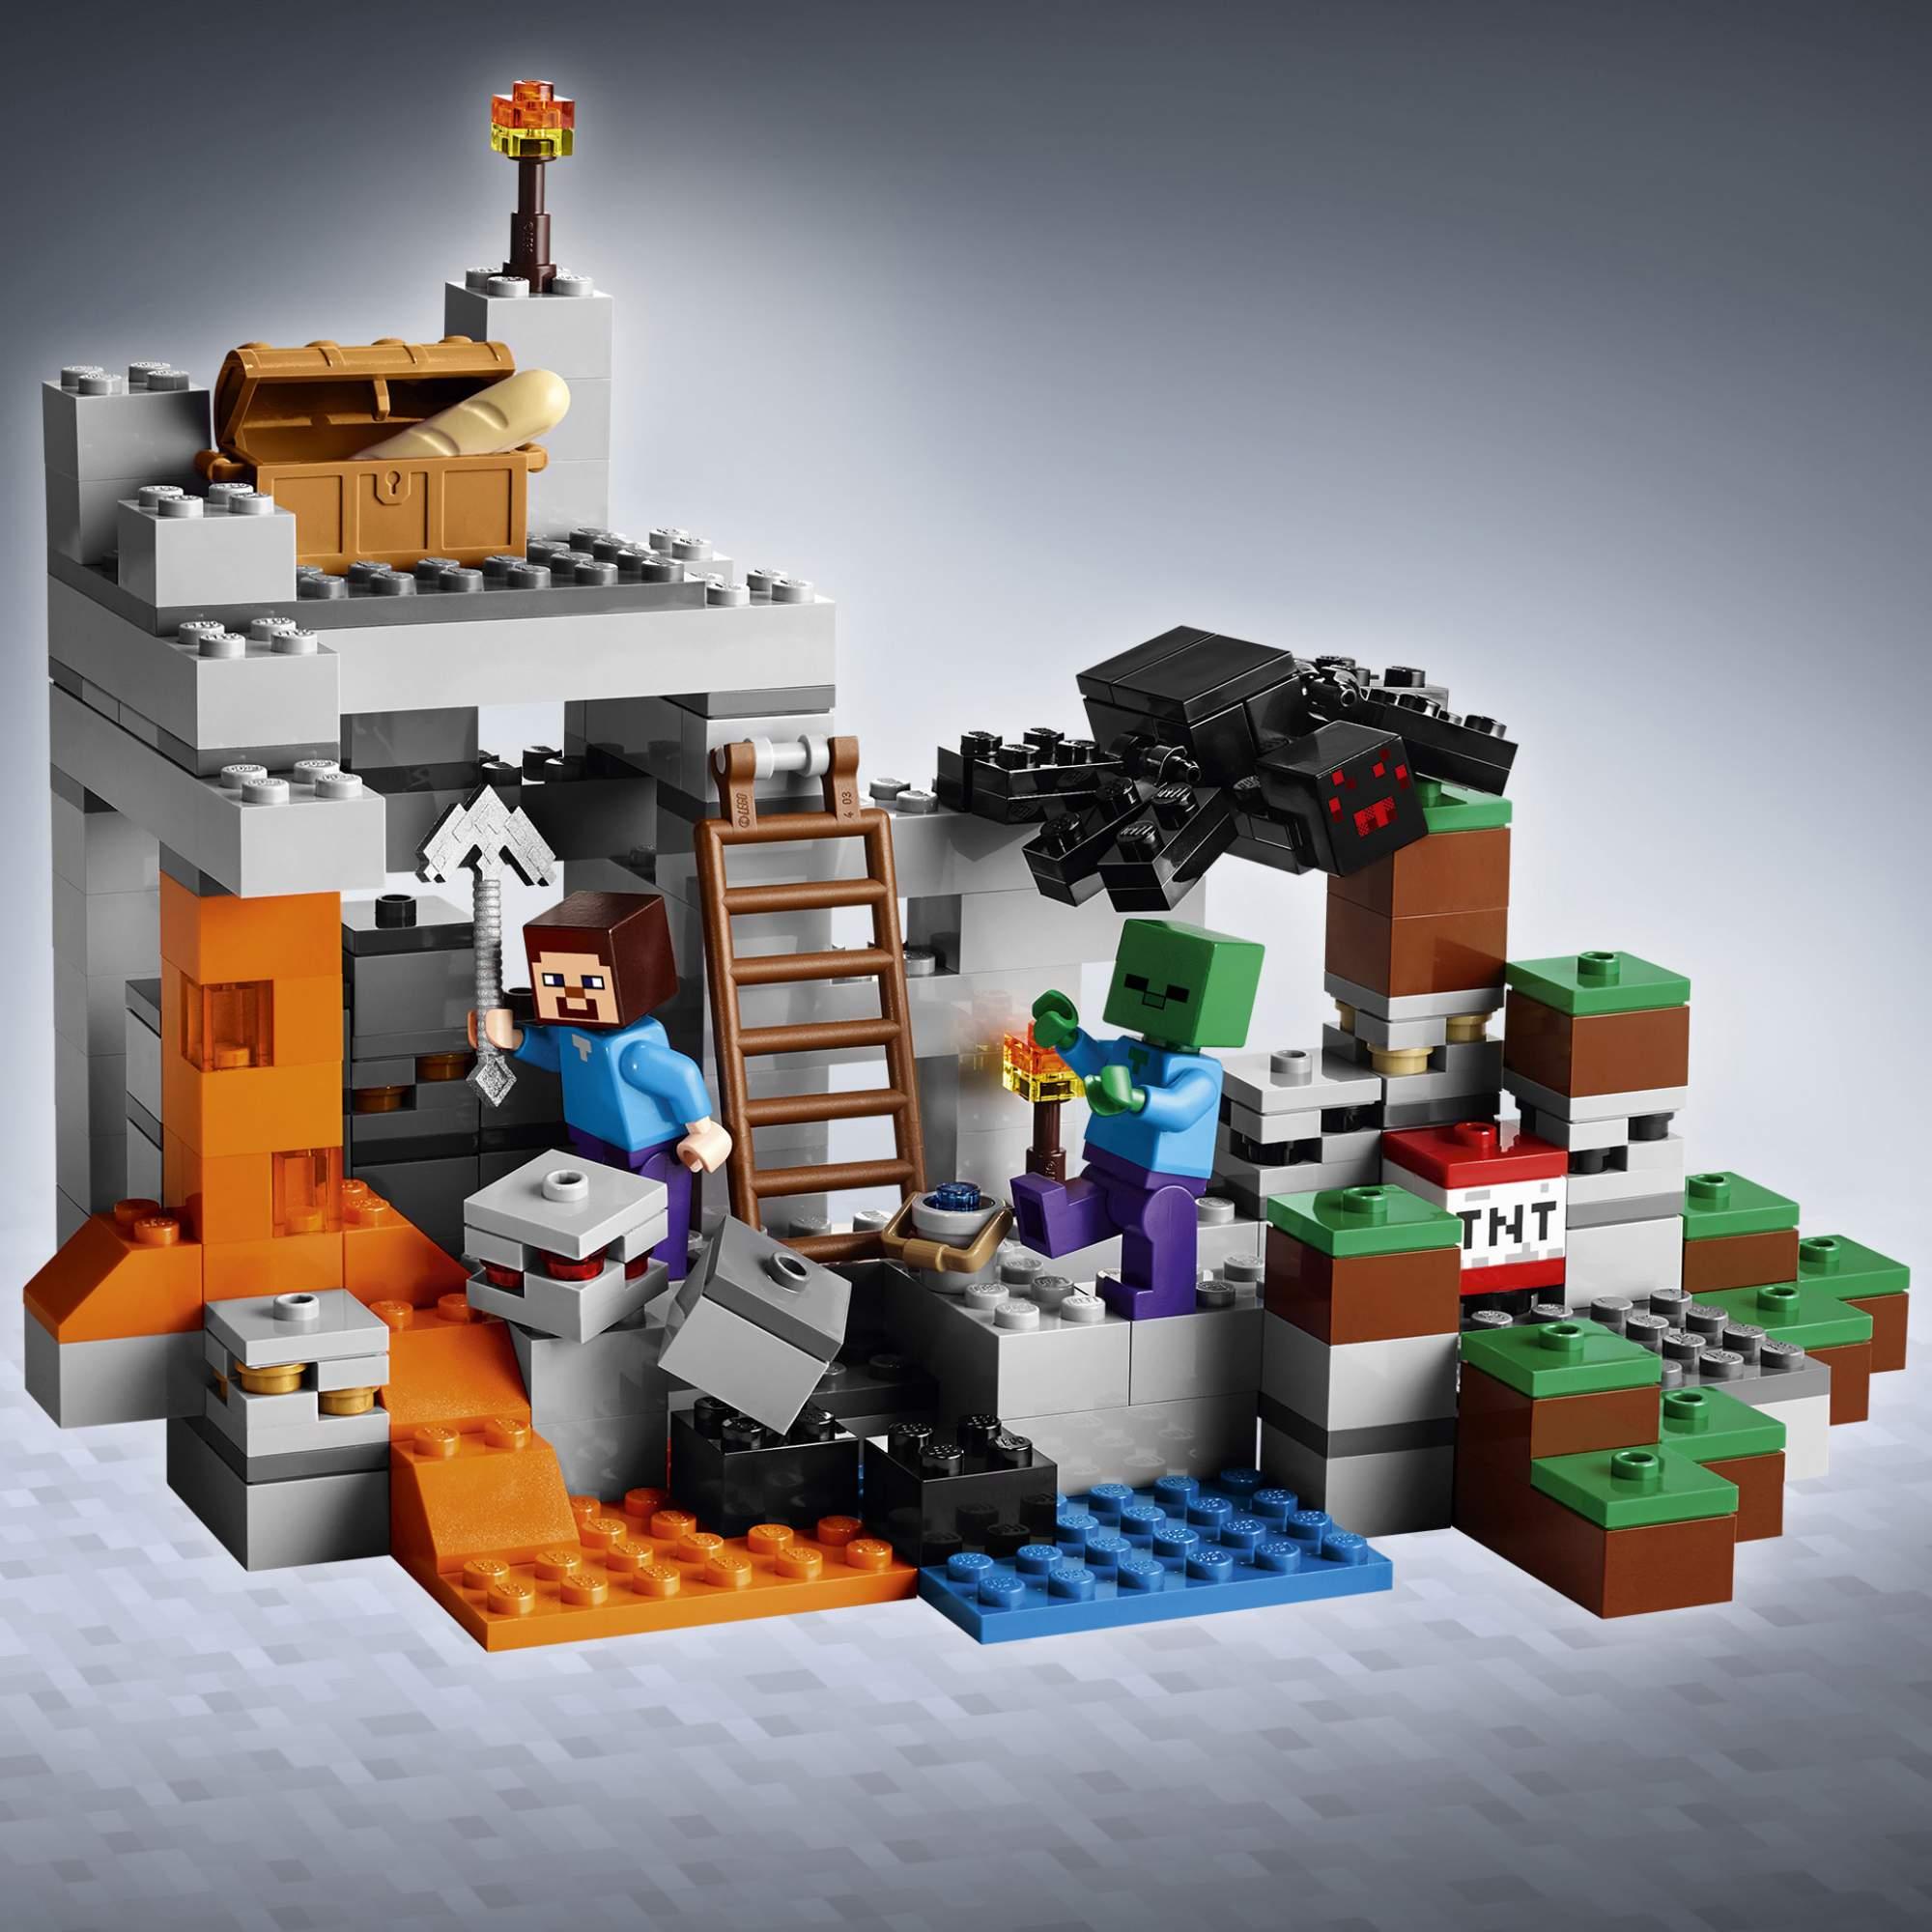 самый дорогой лего майнкрафт #5